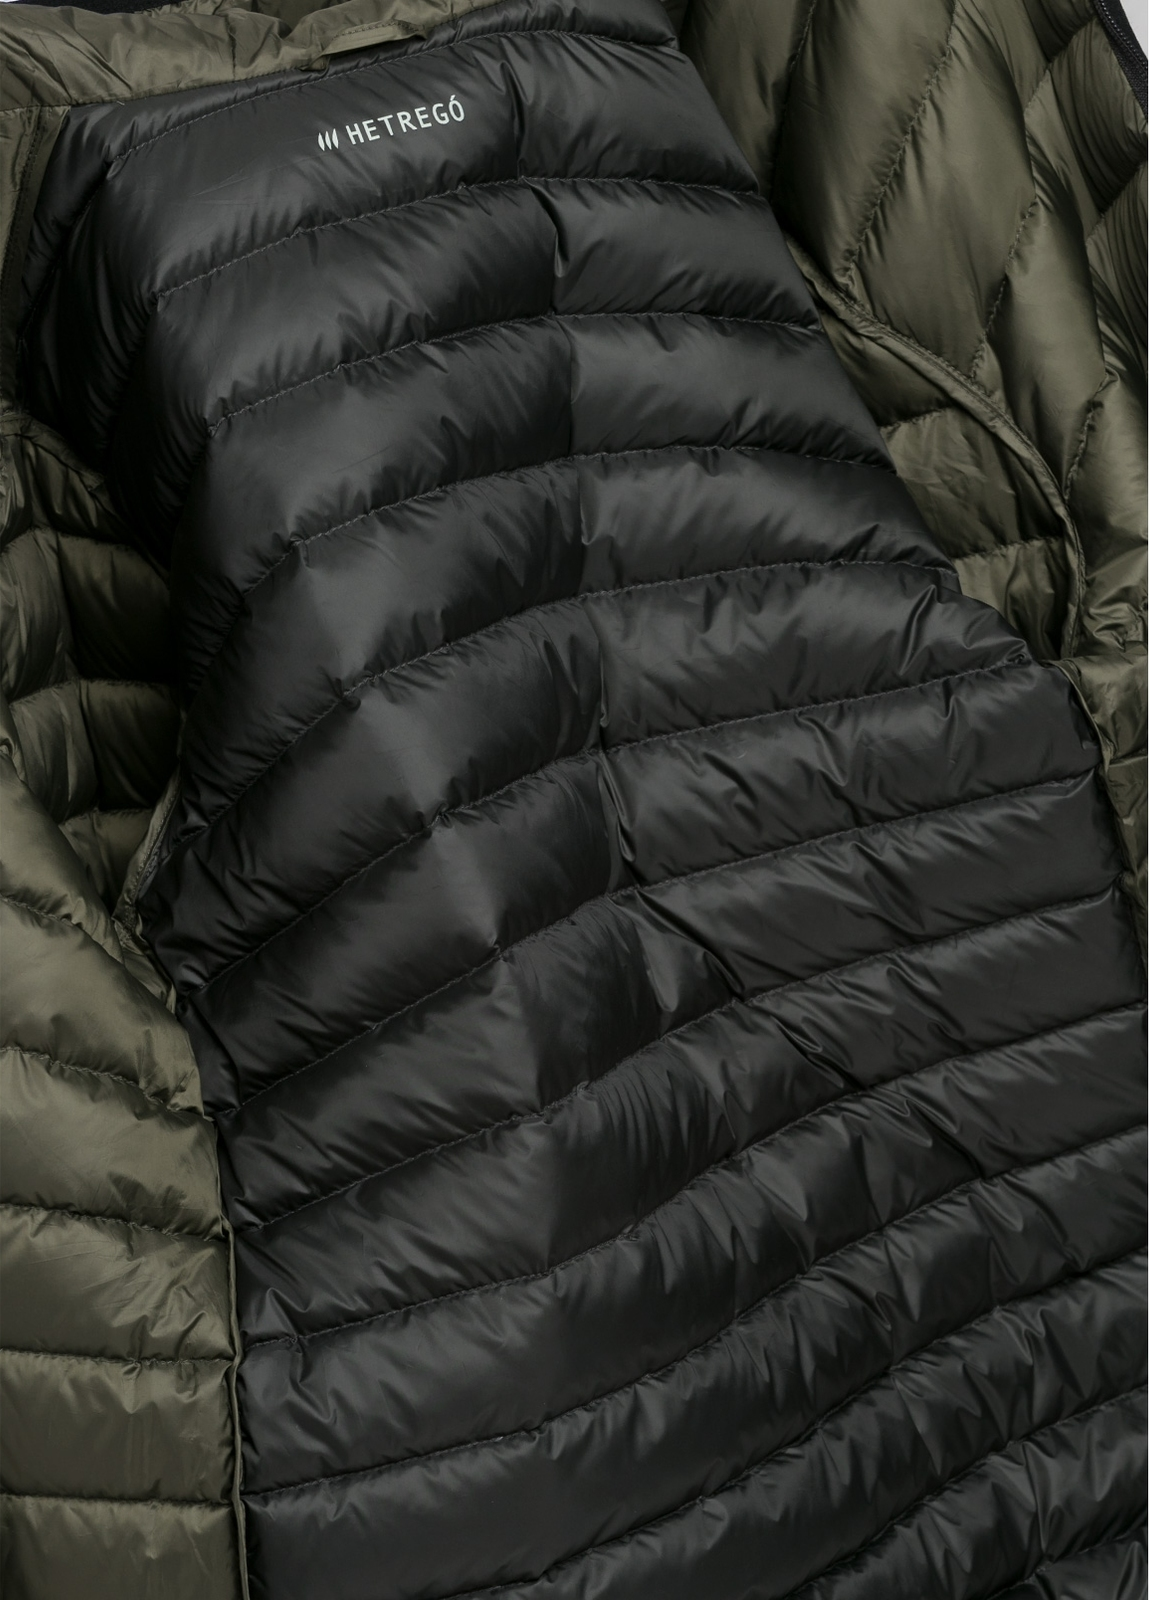 Chaqueta con capucha modelo ZEFIRO color kaki, tejido técnico. - Ítem1